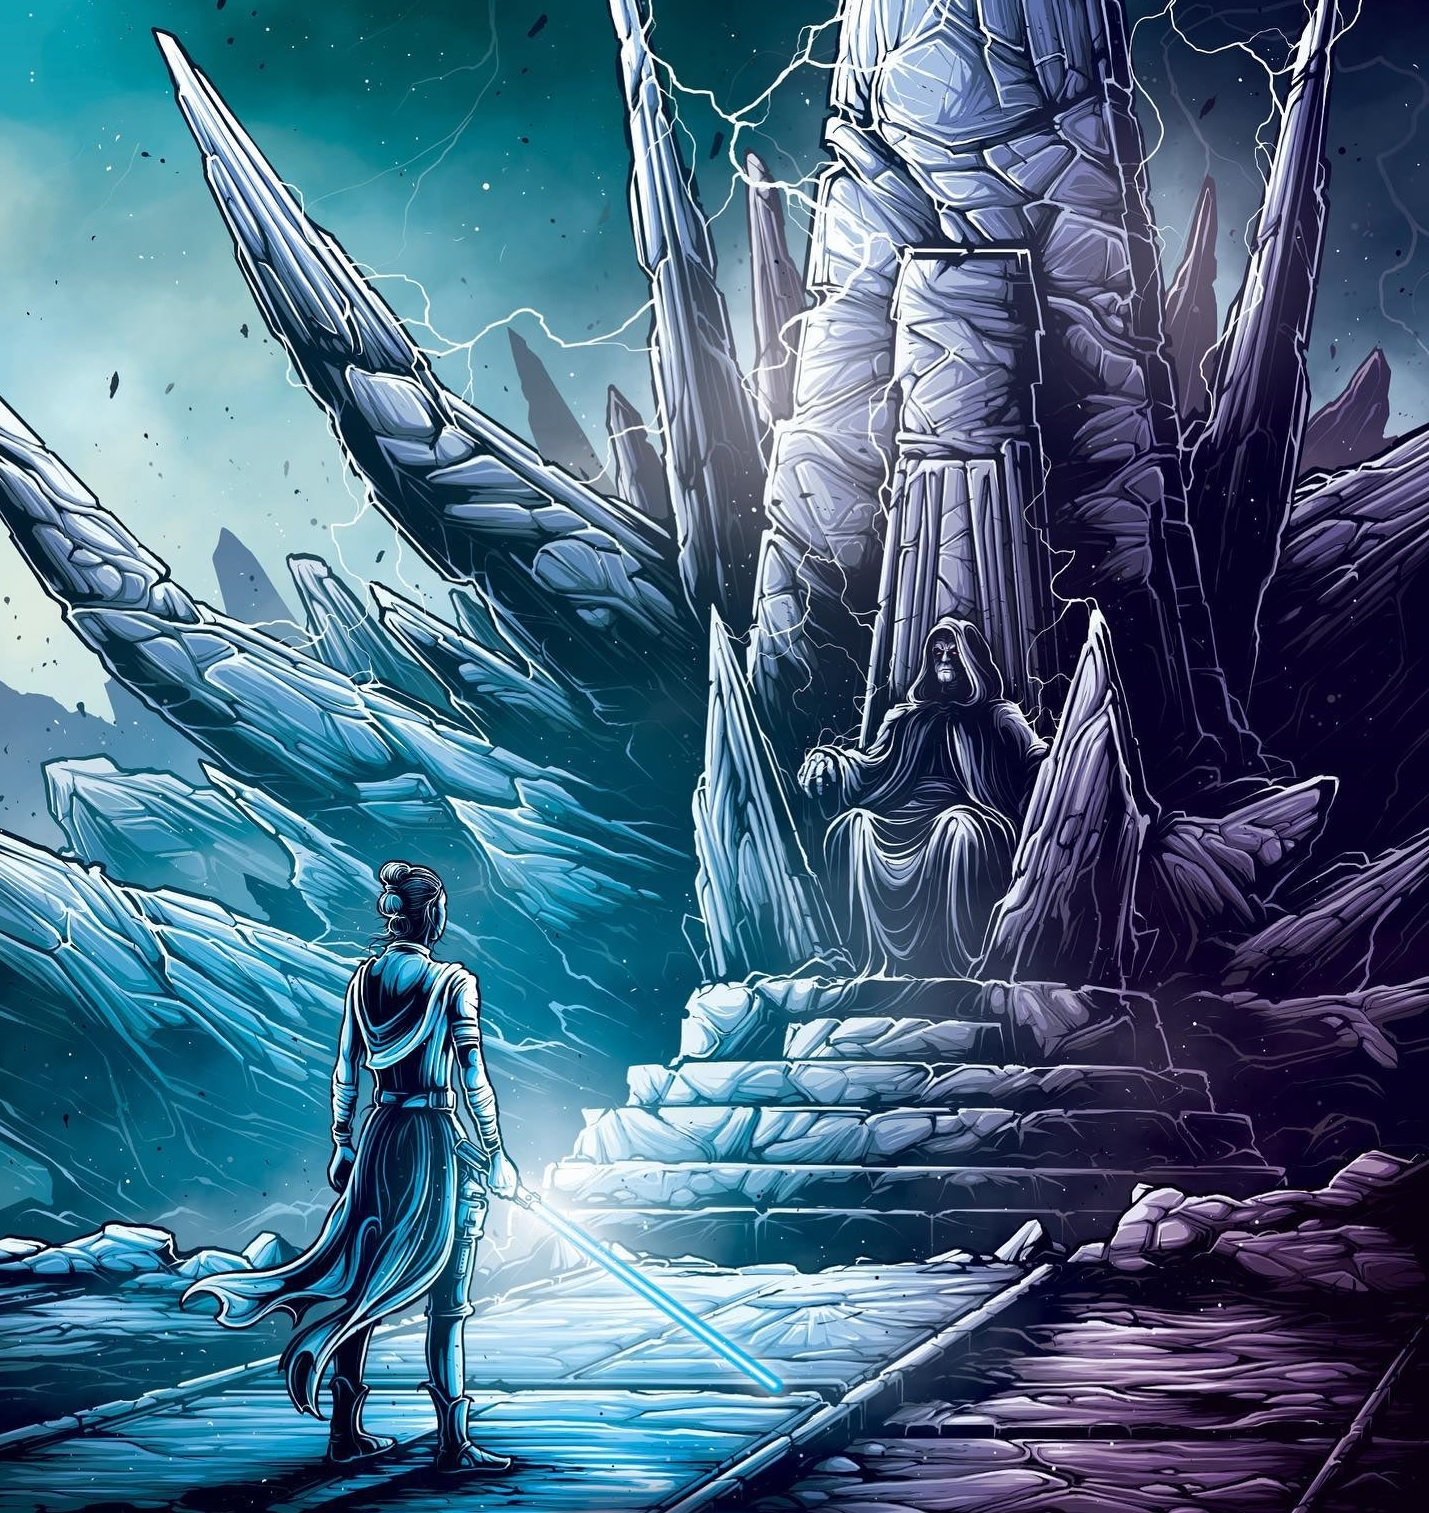 L'Ascesa di Skywalker Poster Imax Palpatine Rey